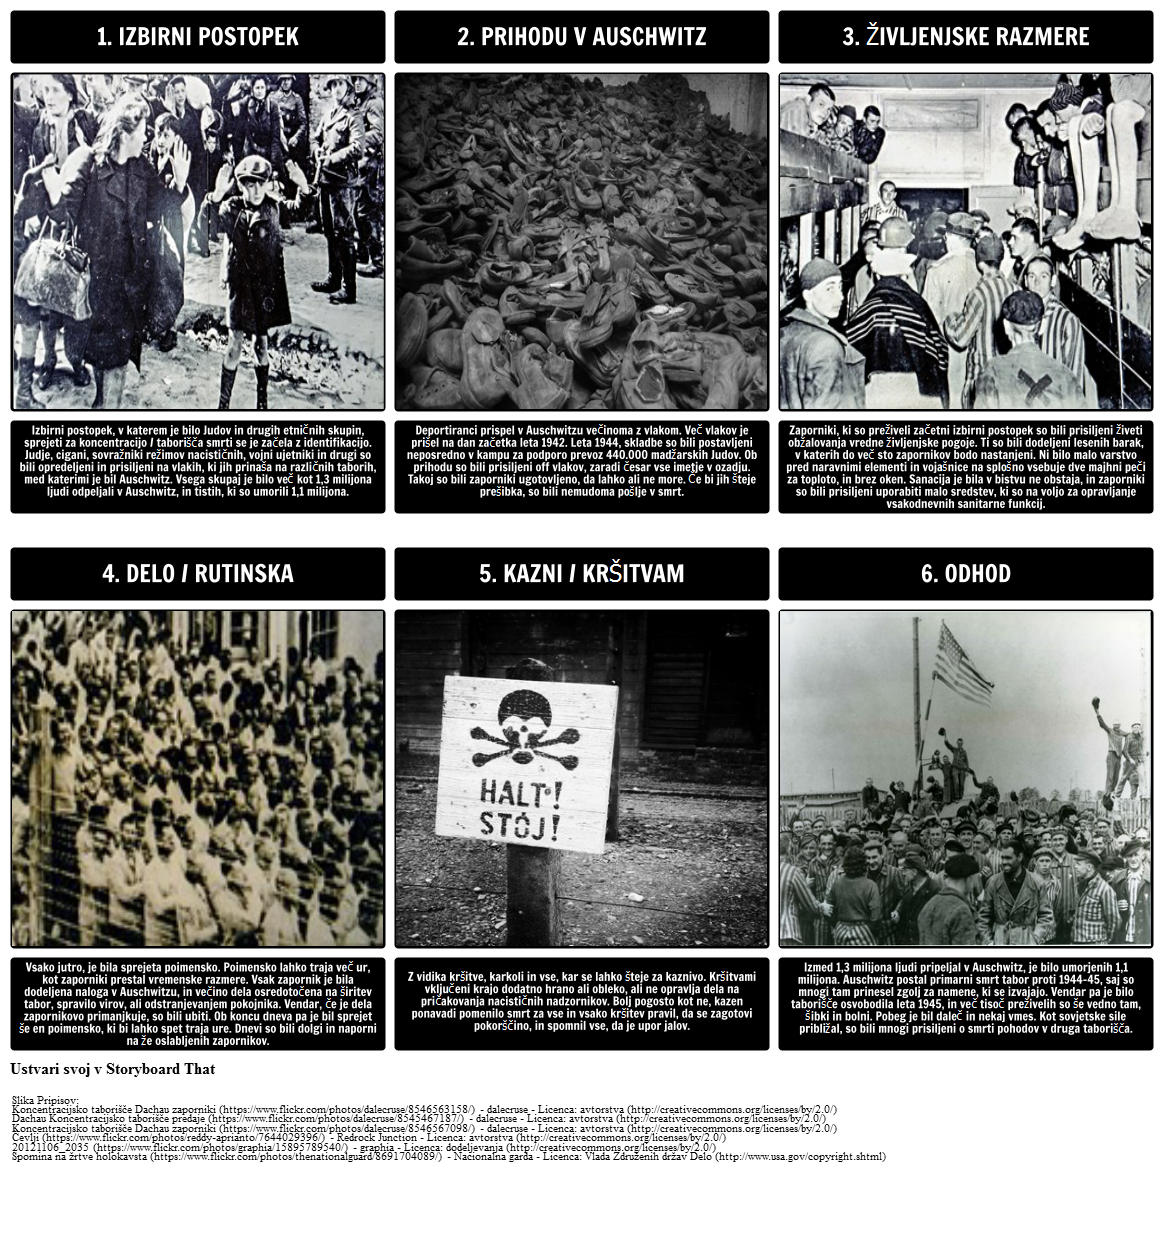 Zgodovina Holokavsta - Življenje v Auschwitzu